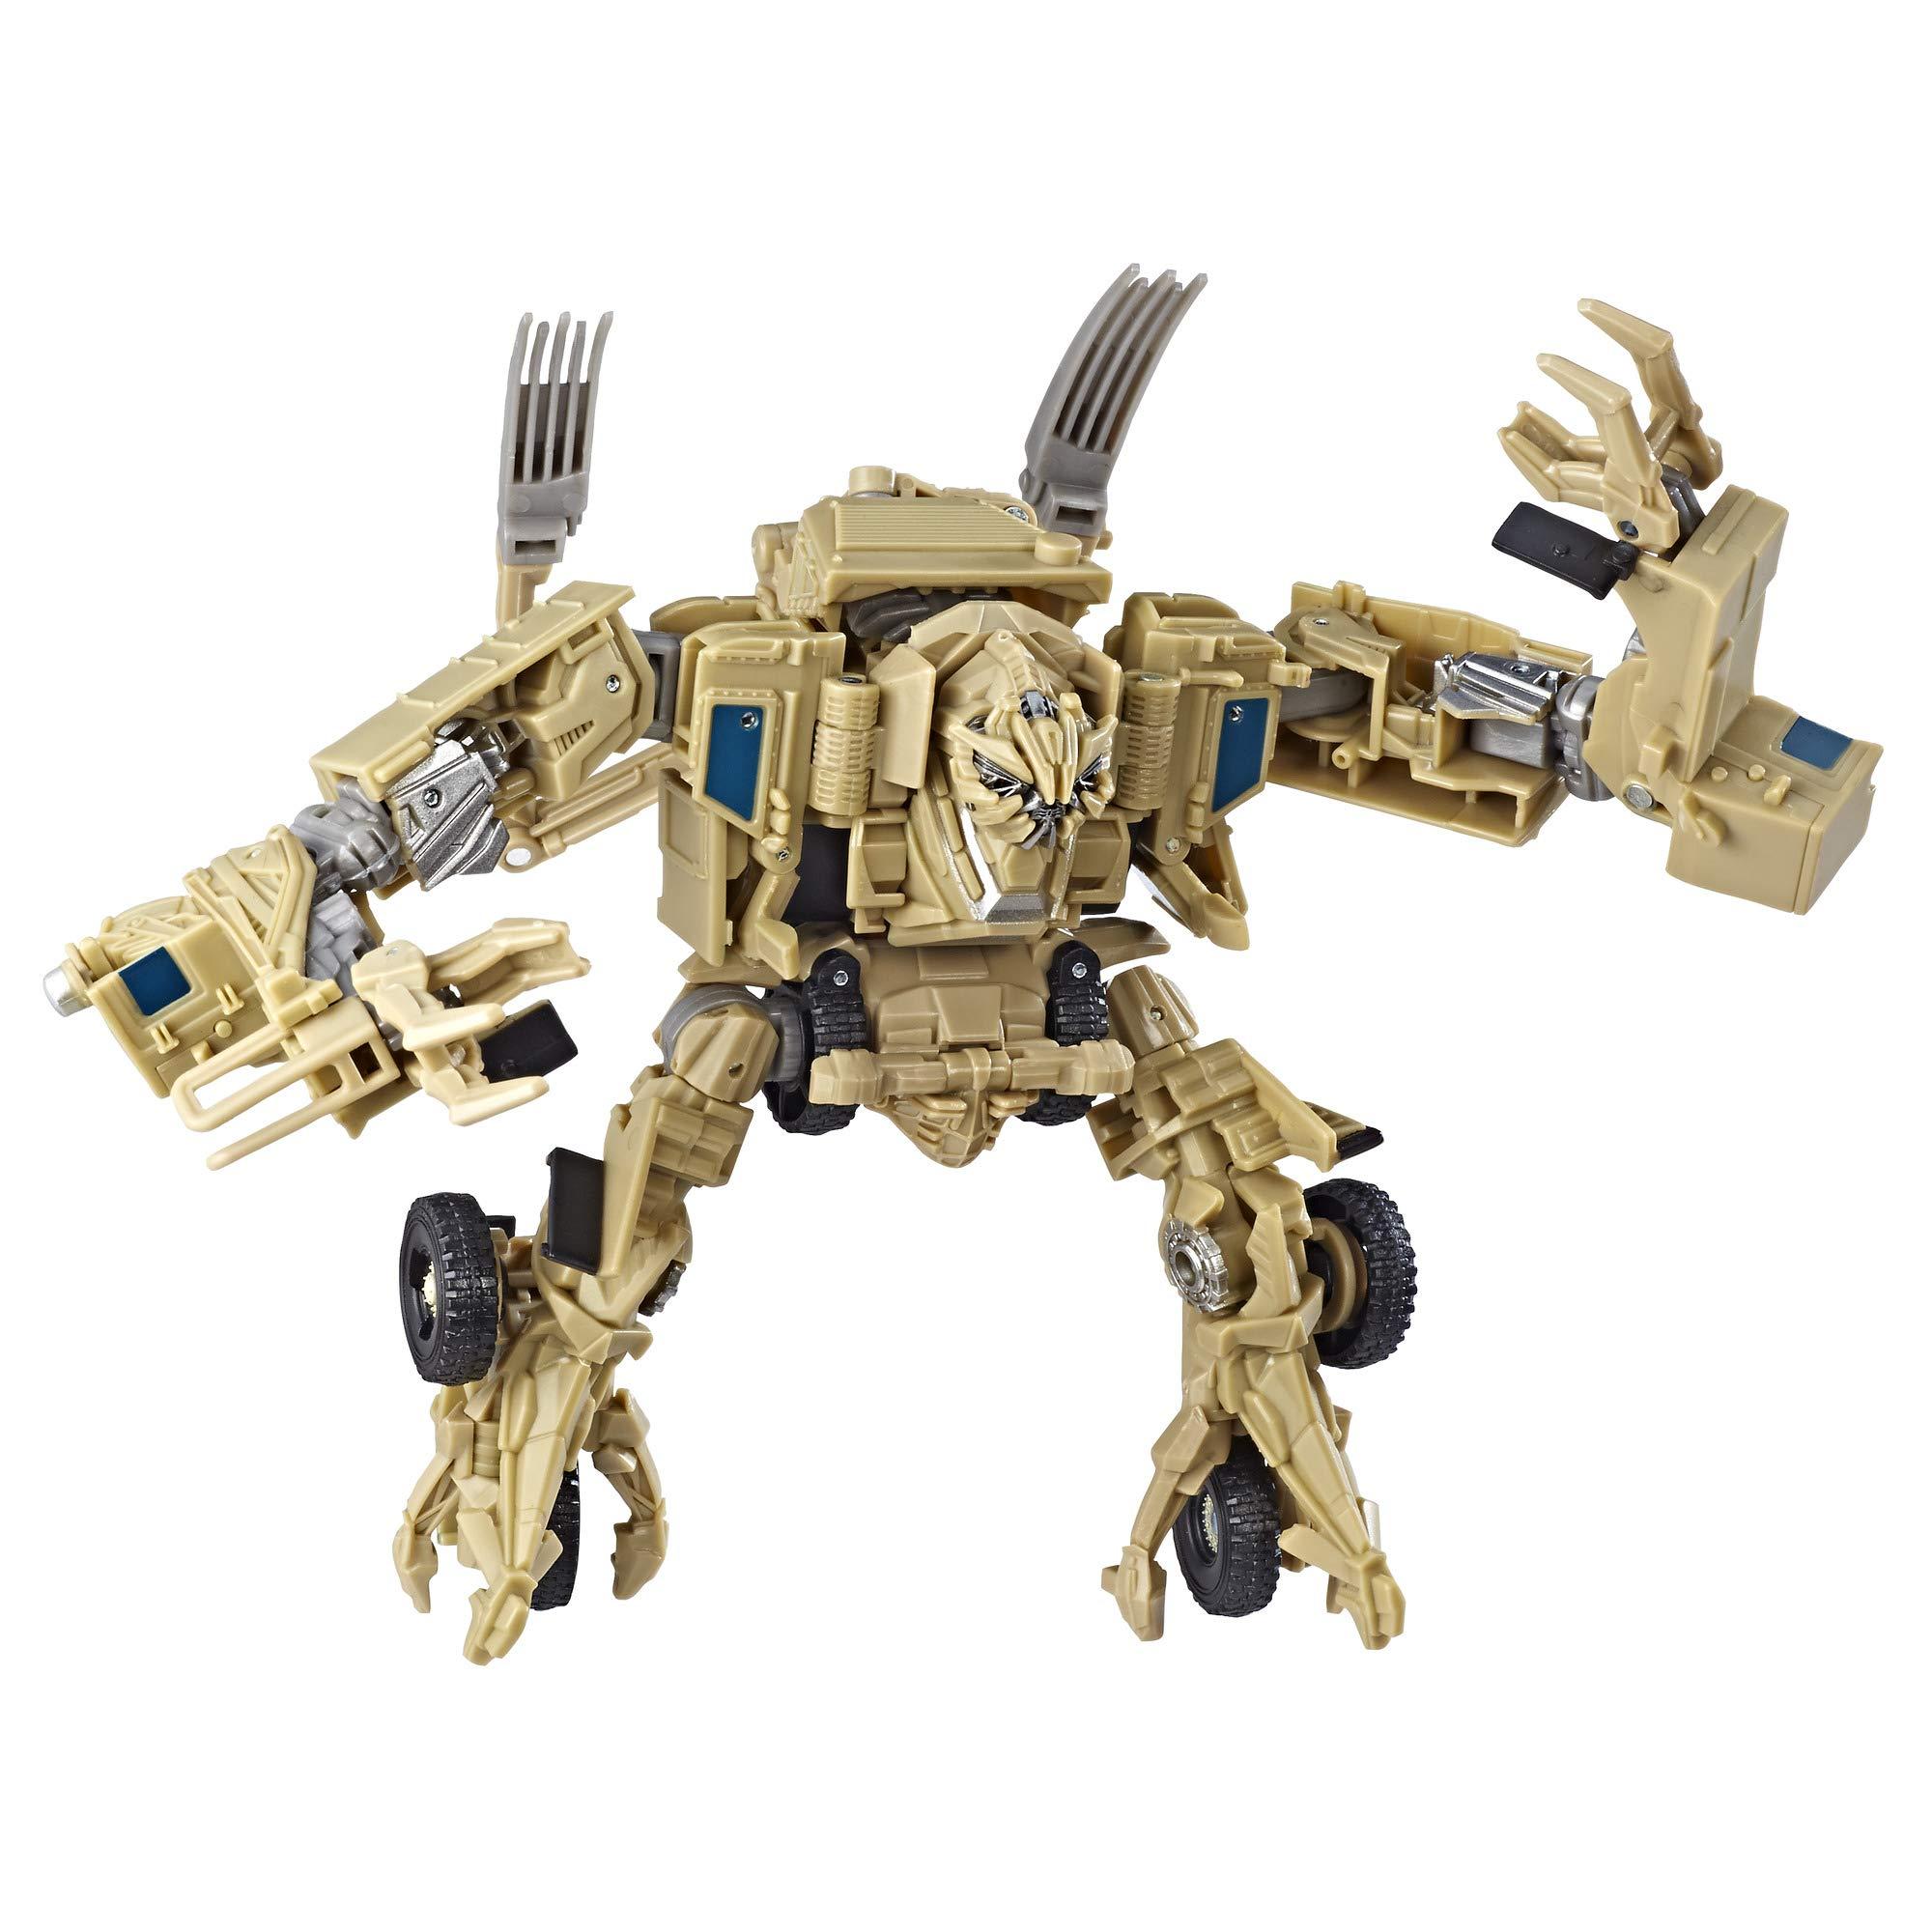 Transformers Studio Series Number 33 Voyager Class Bonecrusher